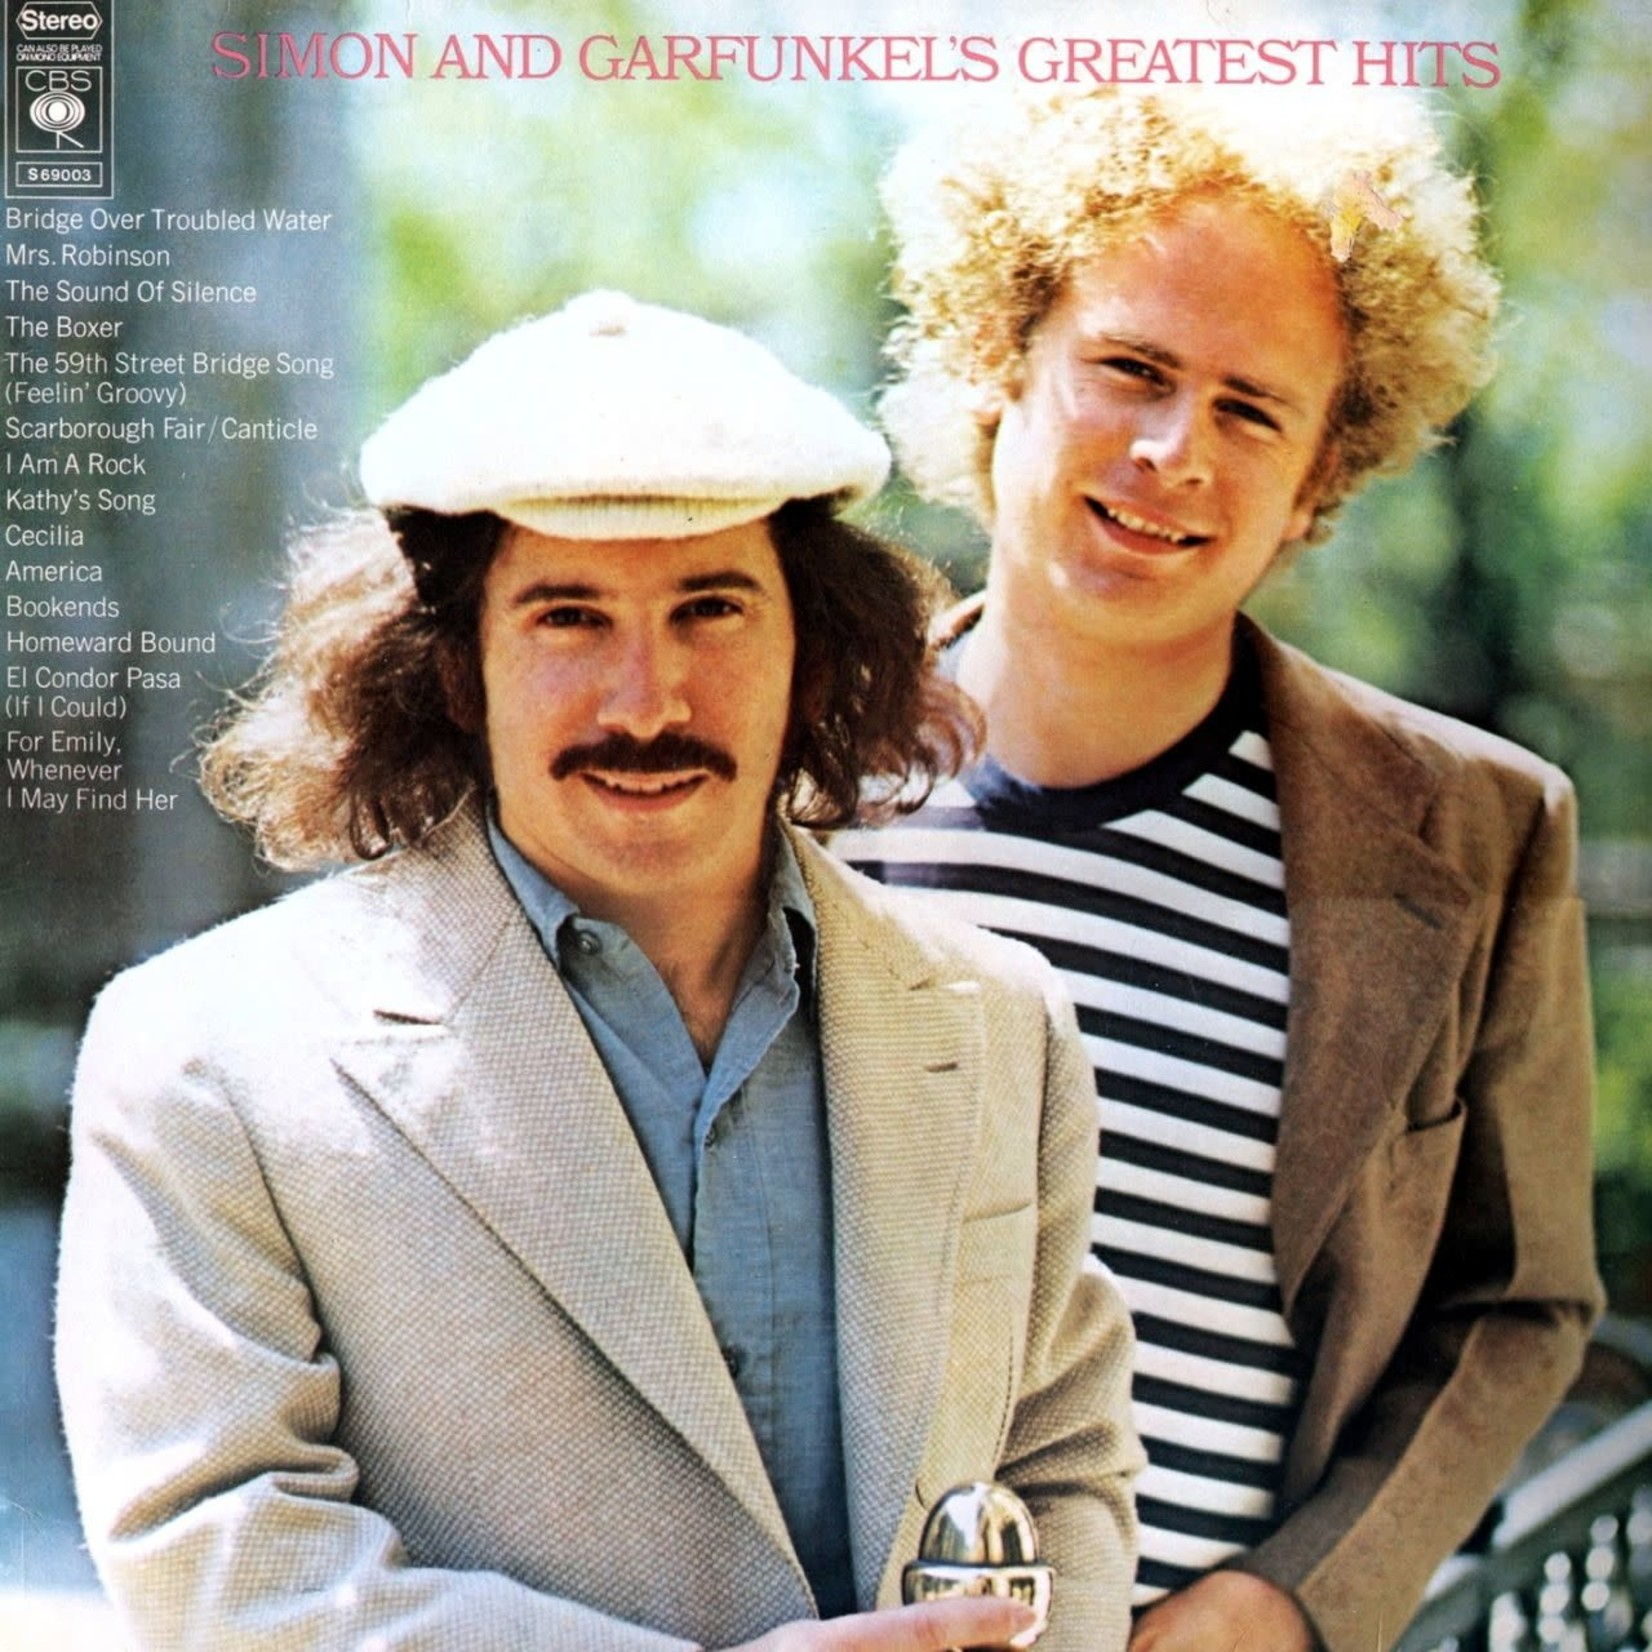 [Vintage] Simon & Garfunkel: Greatest Hits